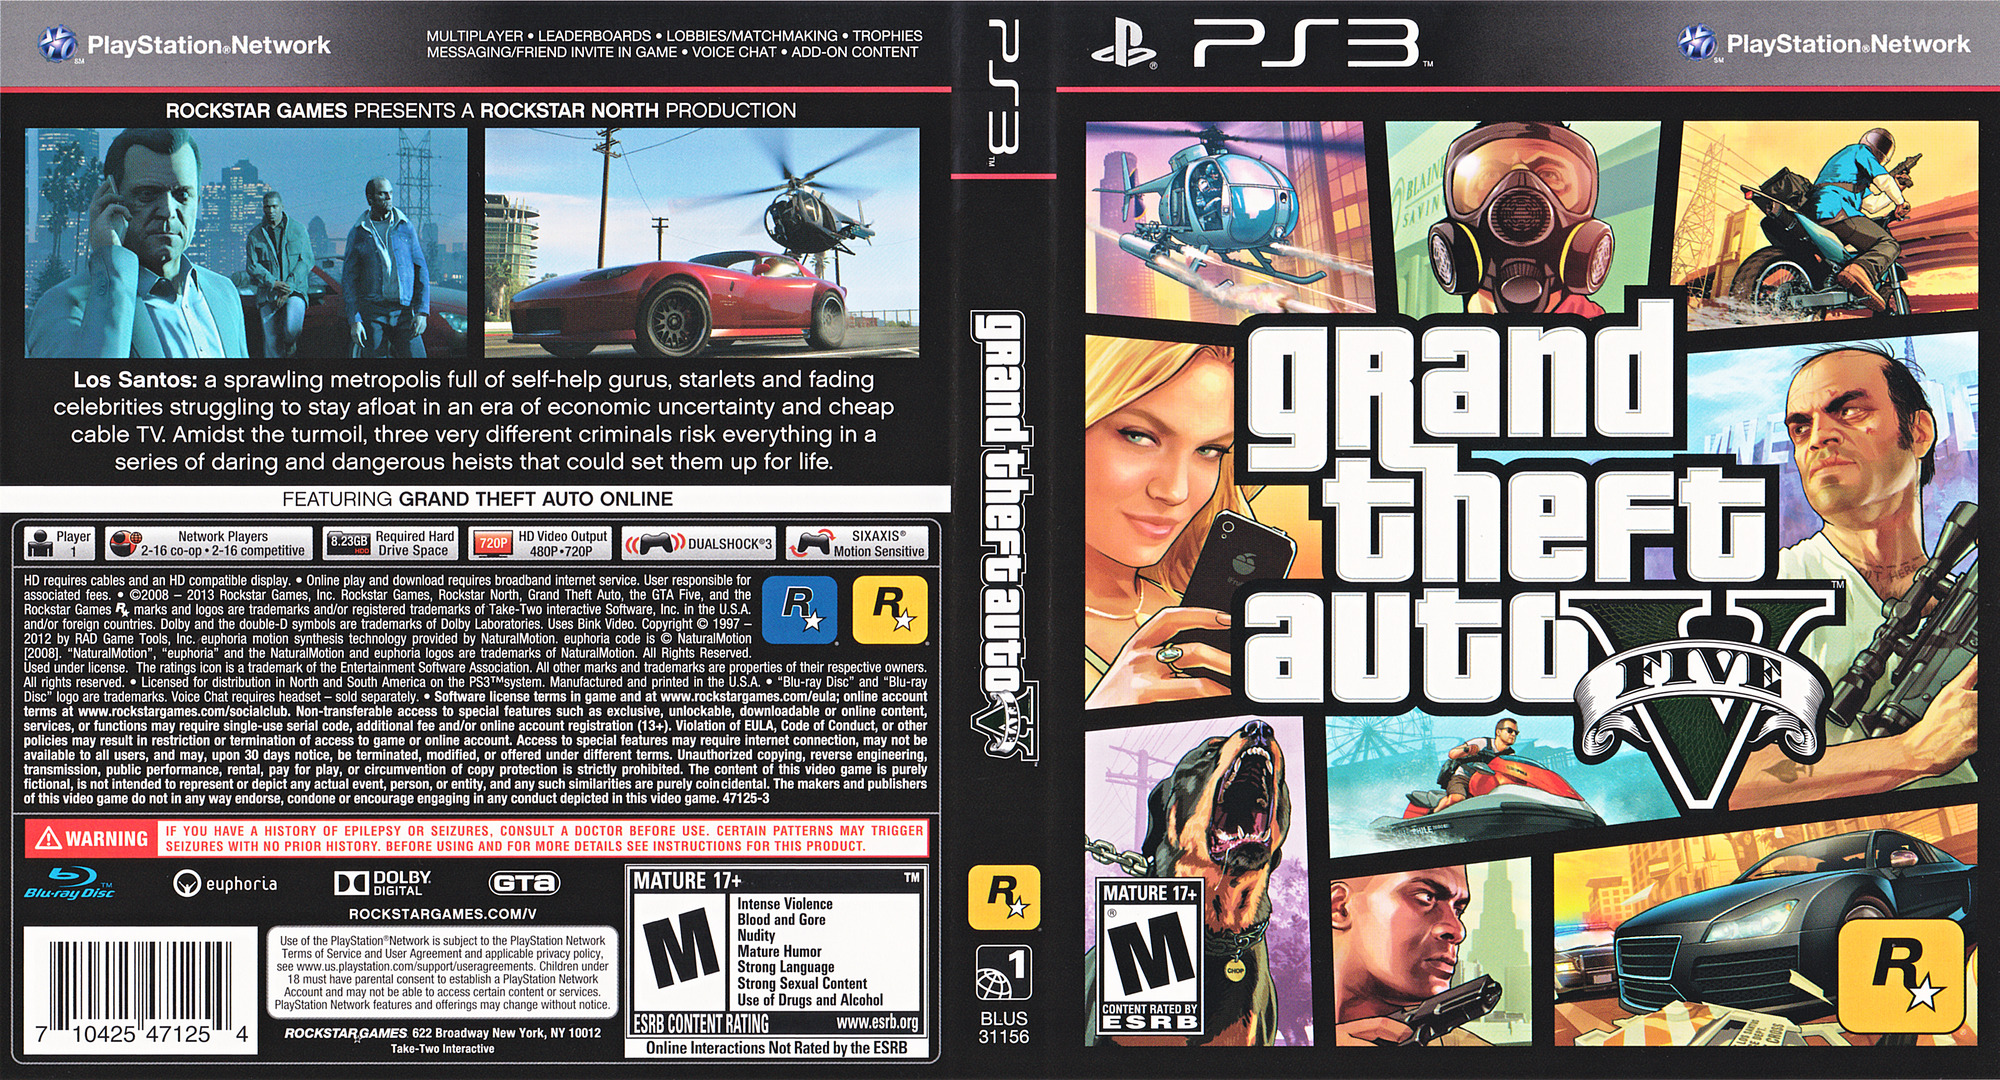 BLUS31156 - Grand Theft Auto V